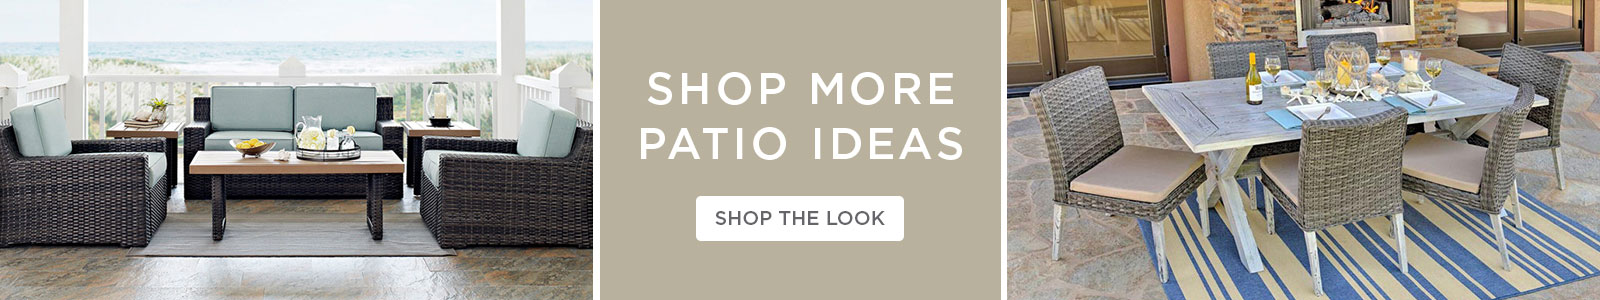 Shop More Patio Ideas